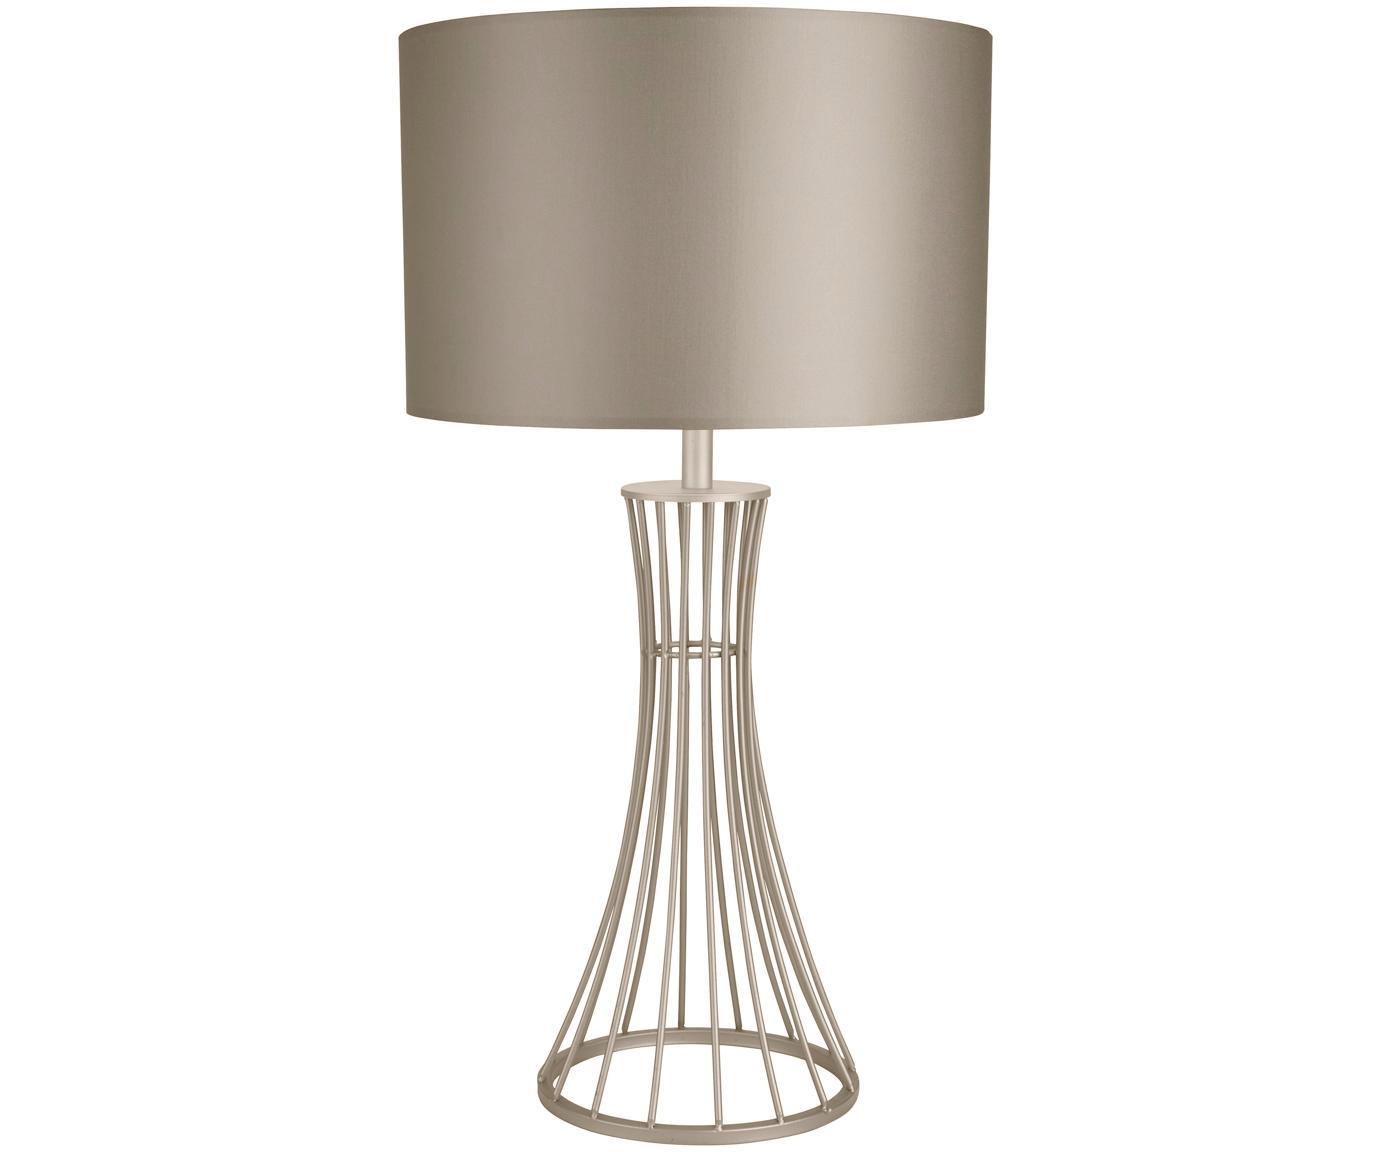 Tafellamp Nanaya in champagnekleur, Lampenkap: textiel, Lampvoet: gecoat staal, Champagnekleurig, Ø 35 x H 66 cm